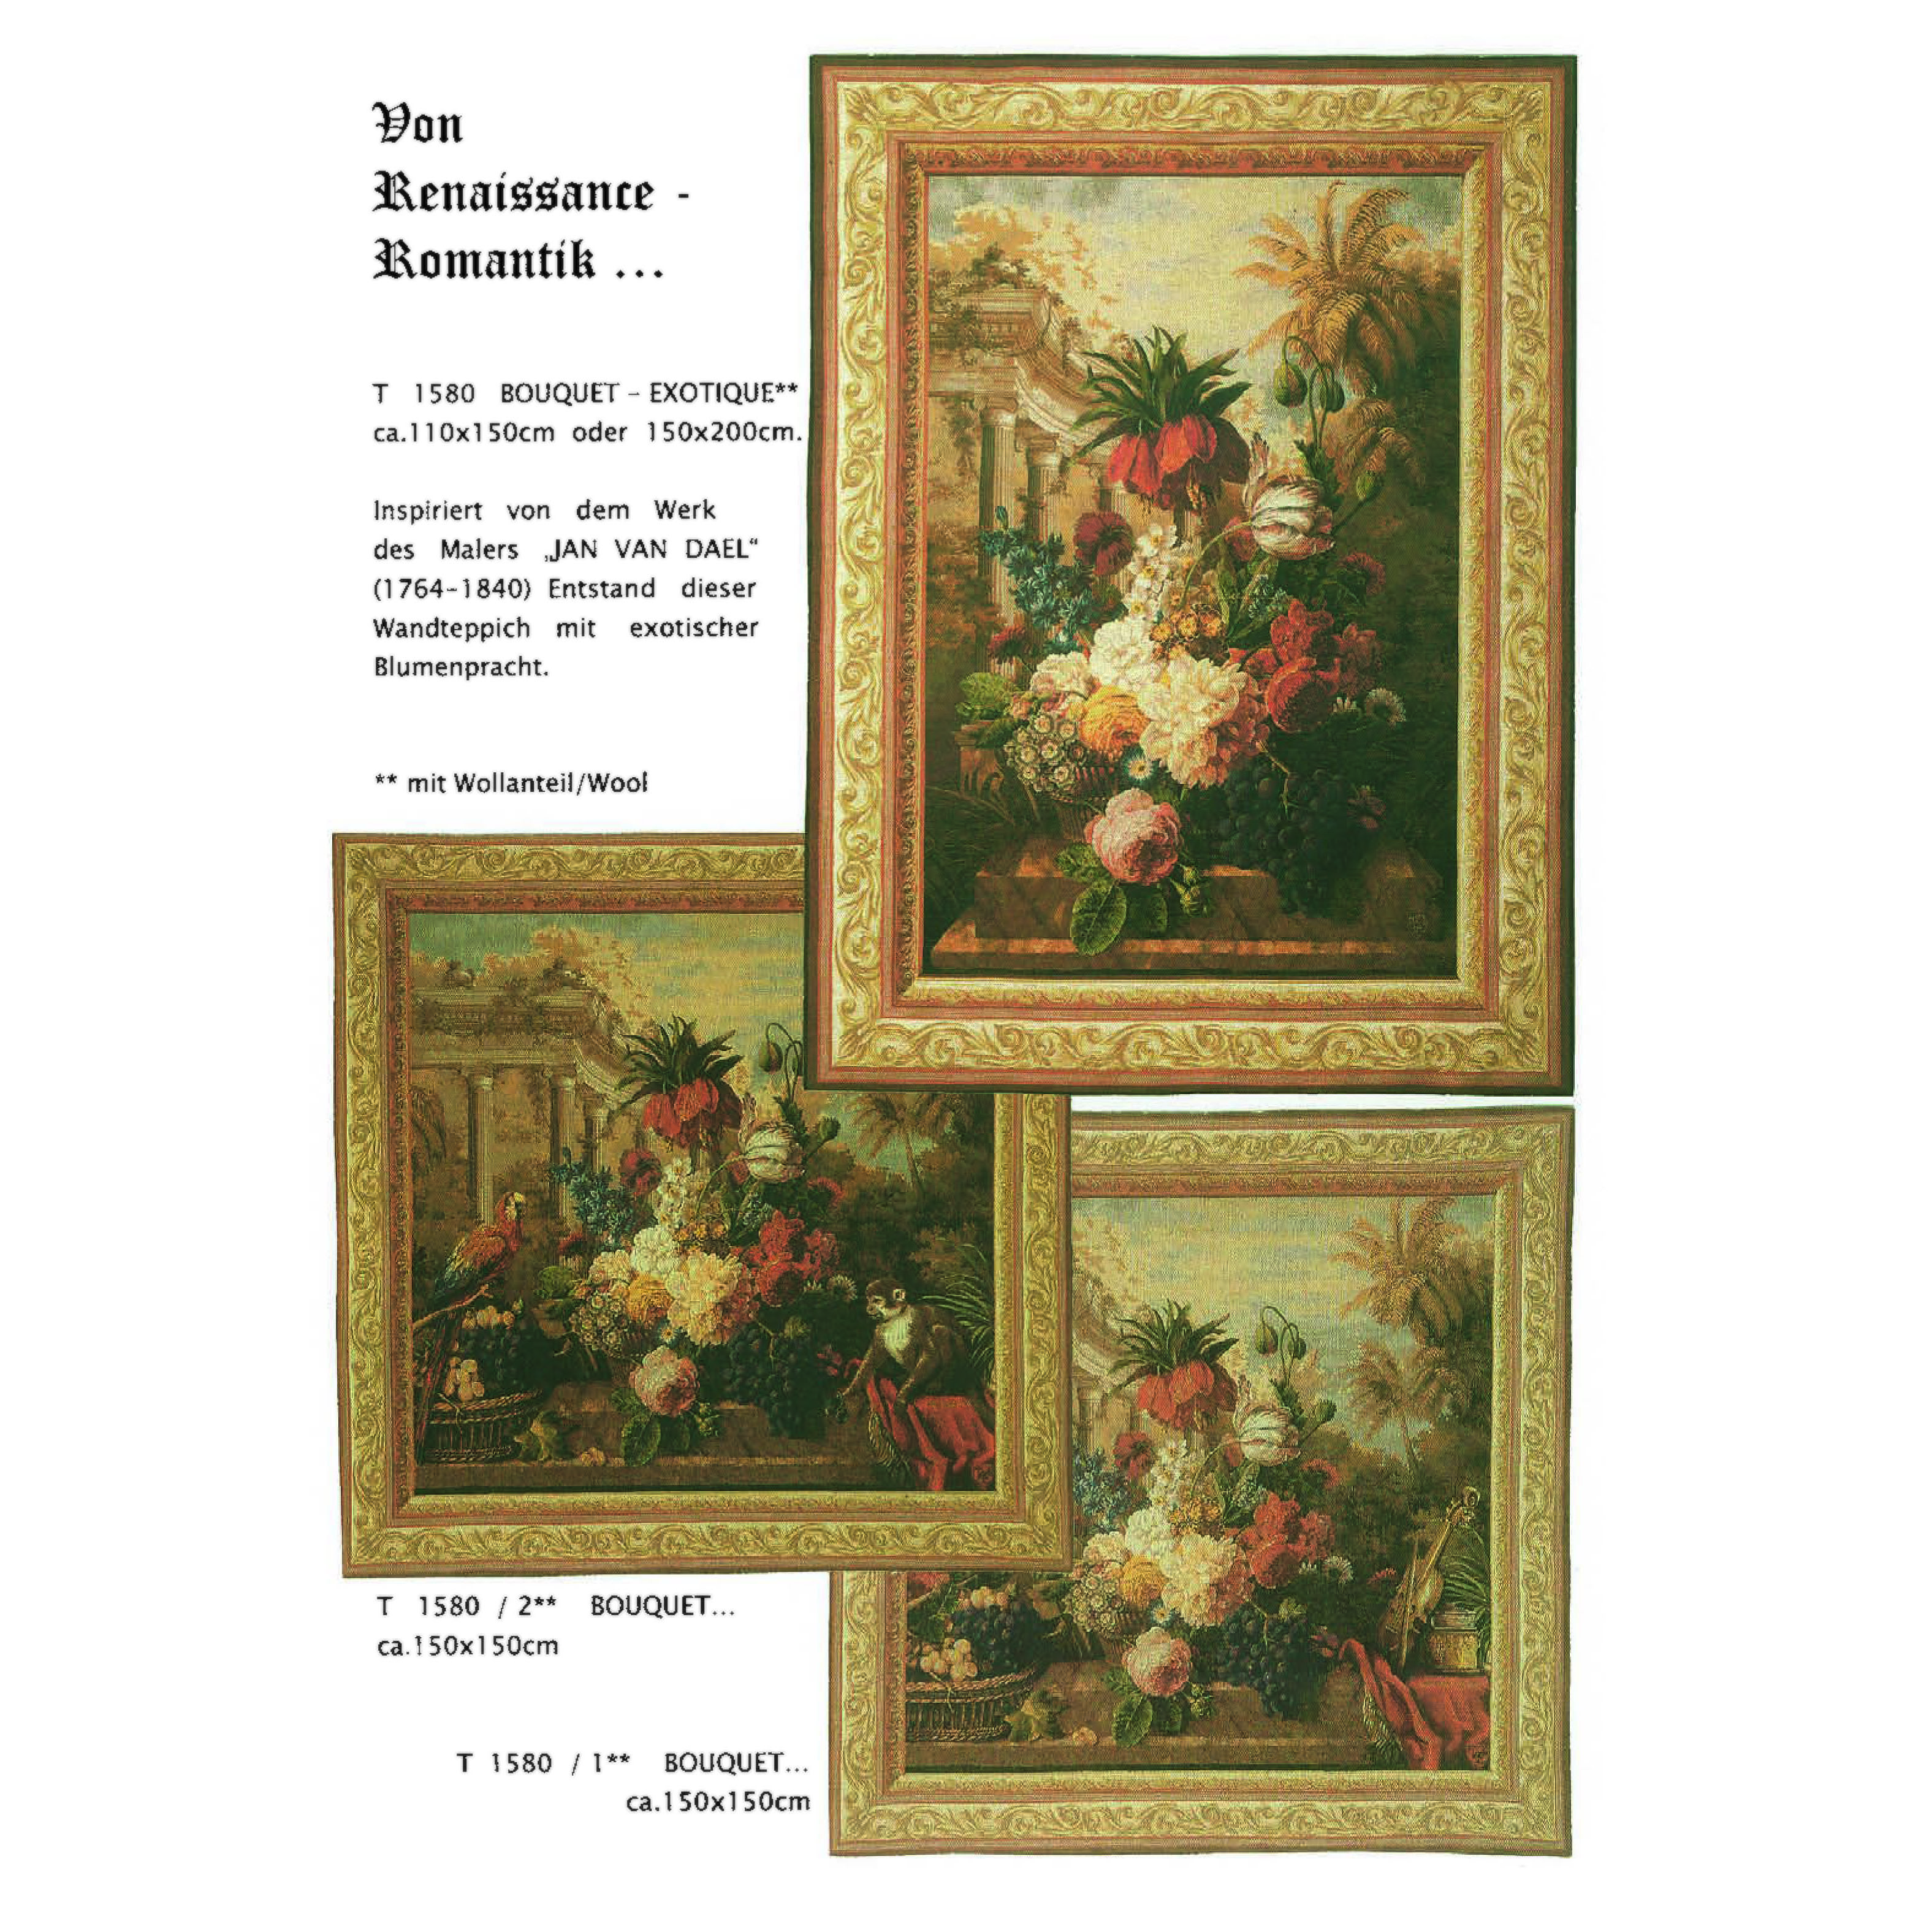 Luka, T1580 Bouquet <br> Гобелен Букет <br>размеры 150х150,  110х150, 150х200